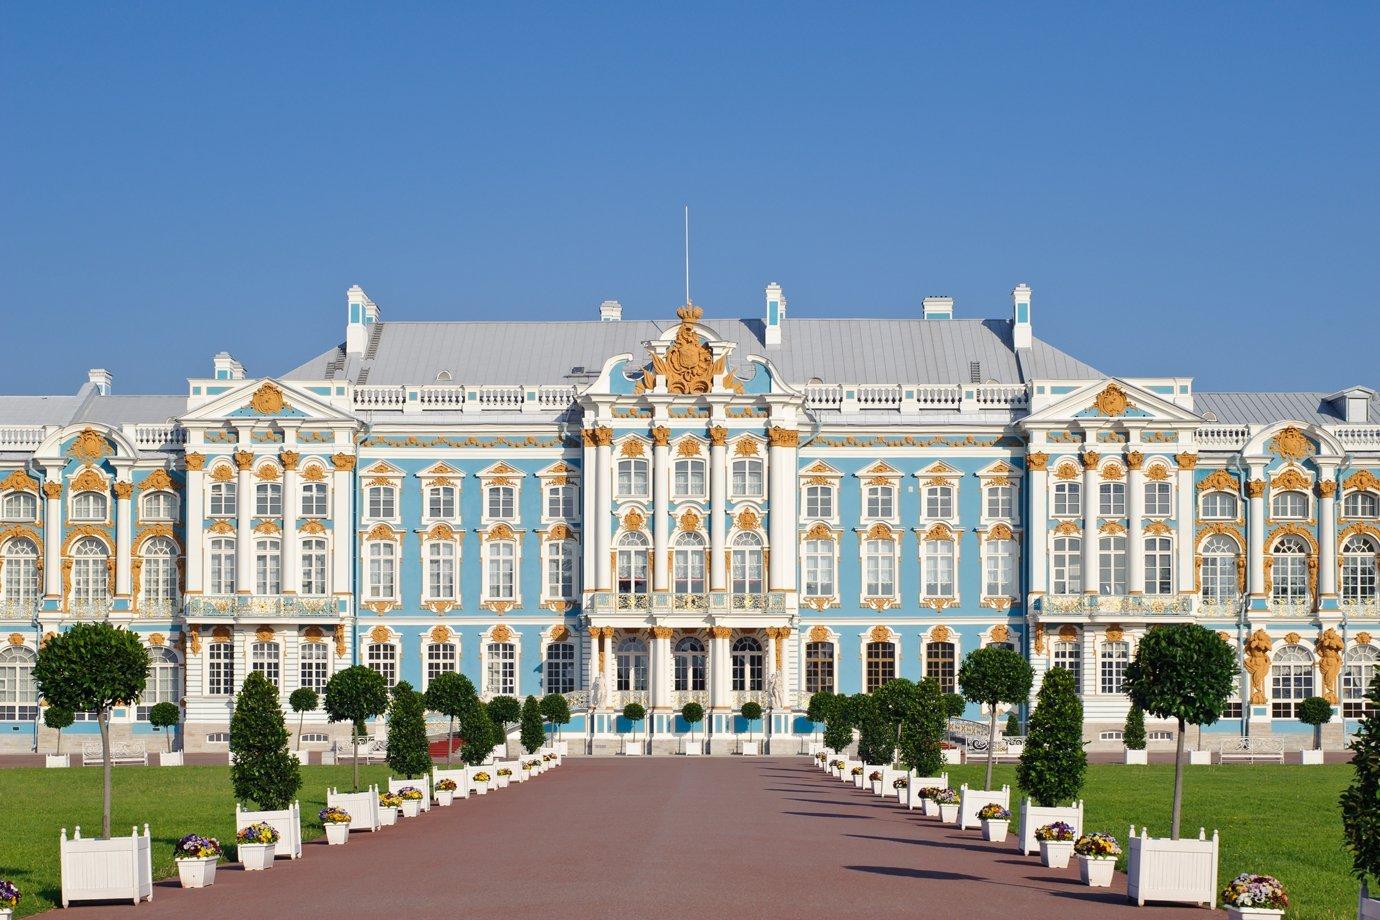 Palácio Catherine, em São Petersburgo